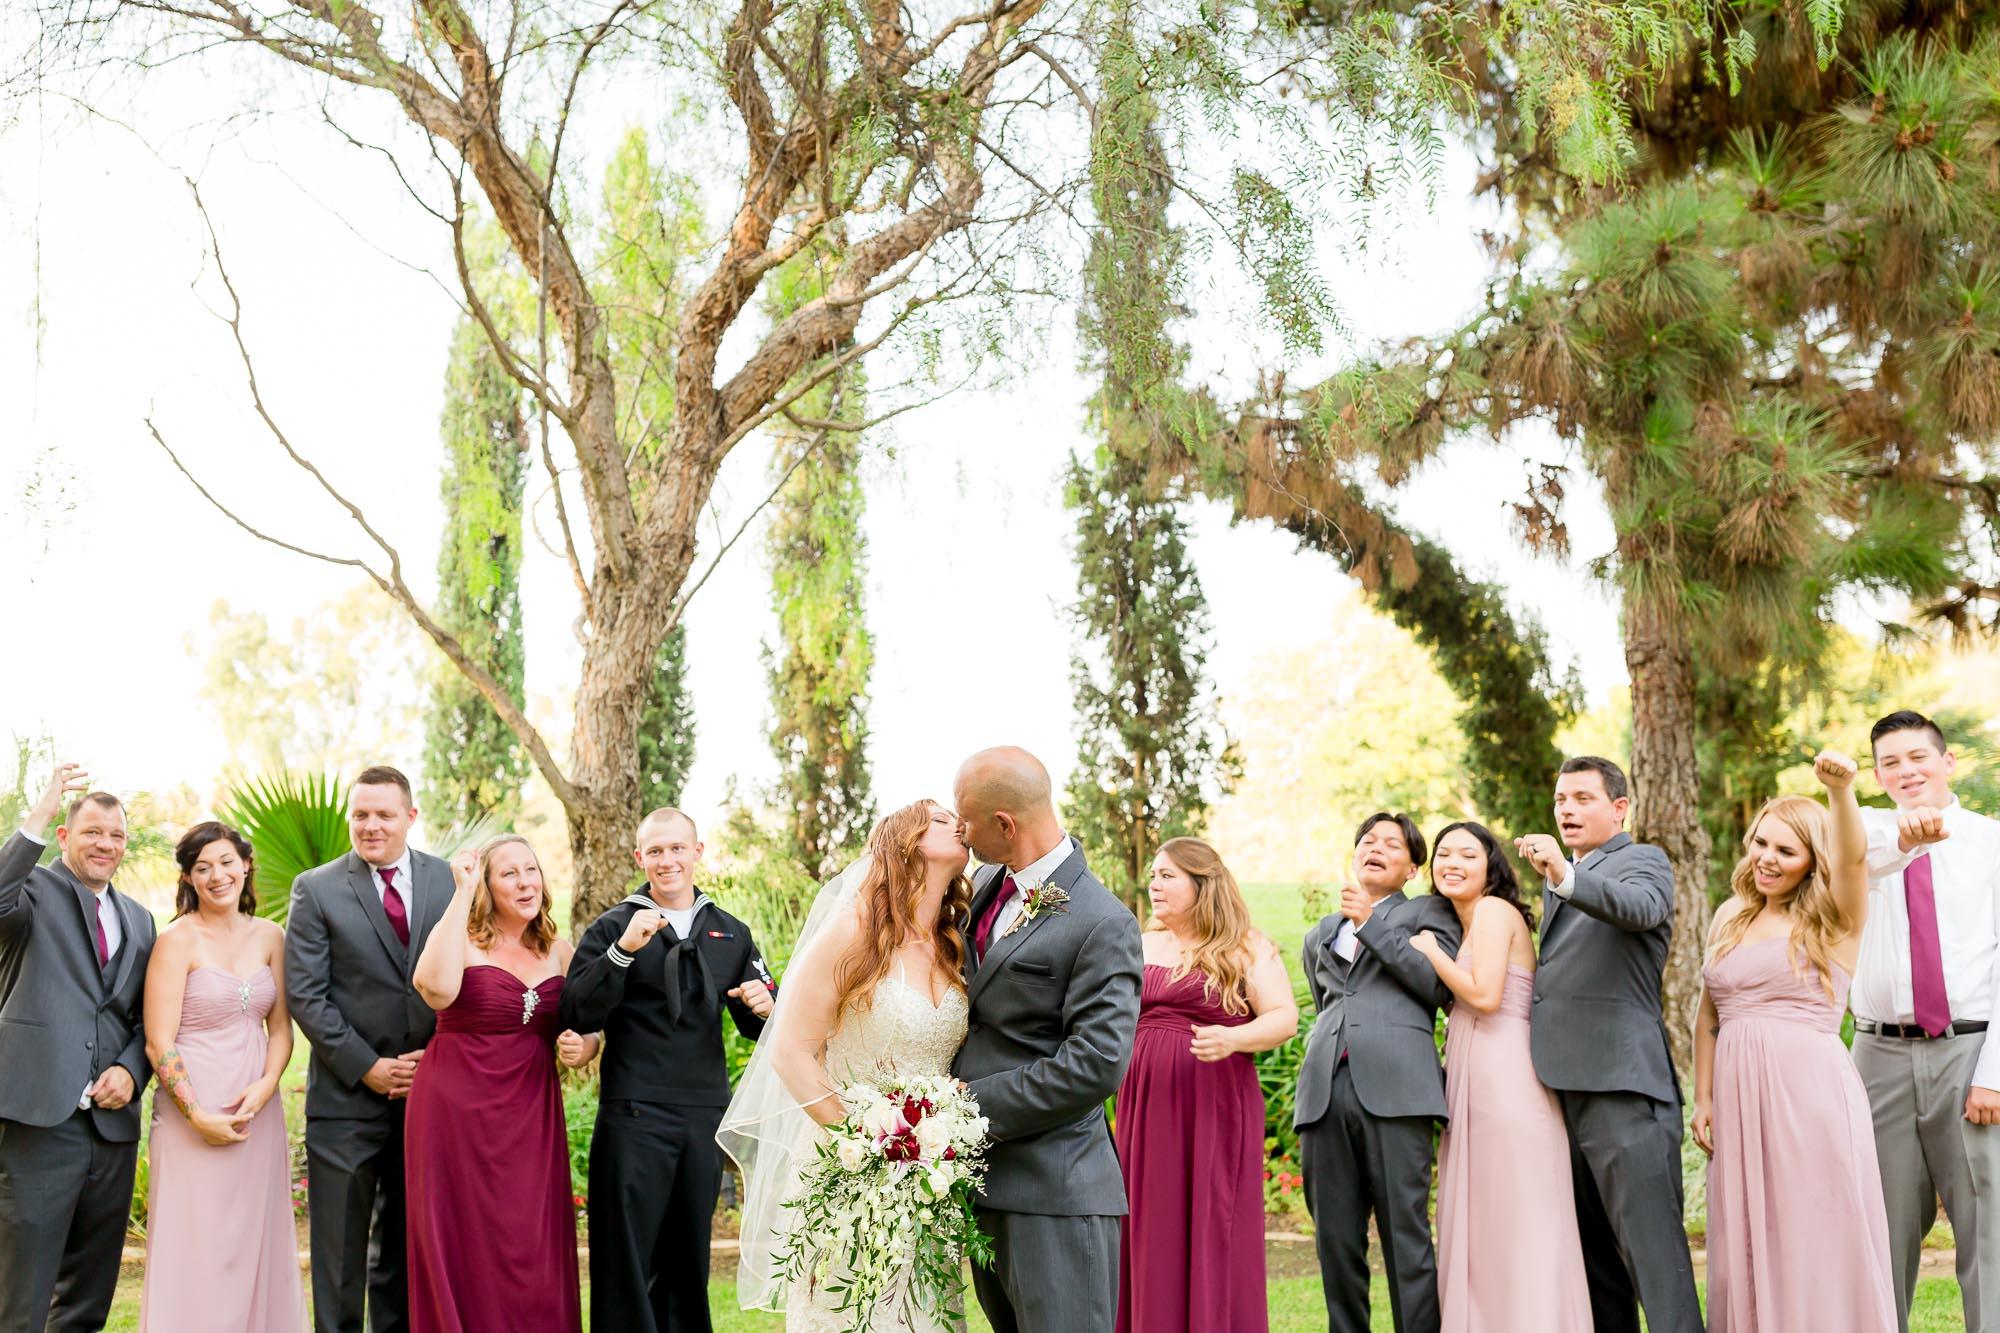 Heather_Pat_San_Marcos_Lakehouse_Wedding_467.jpg